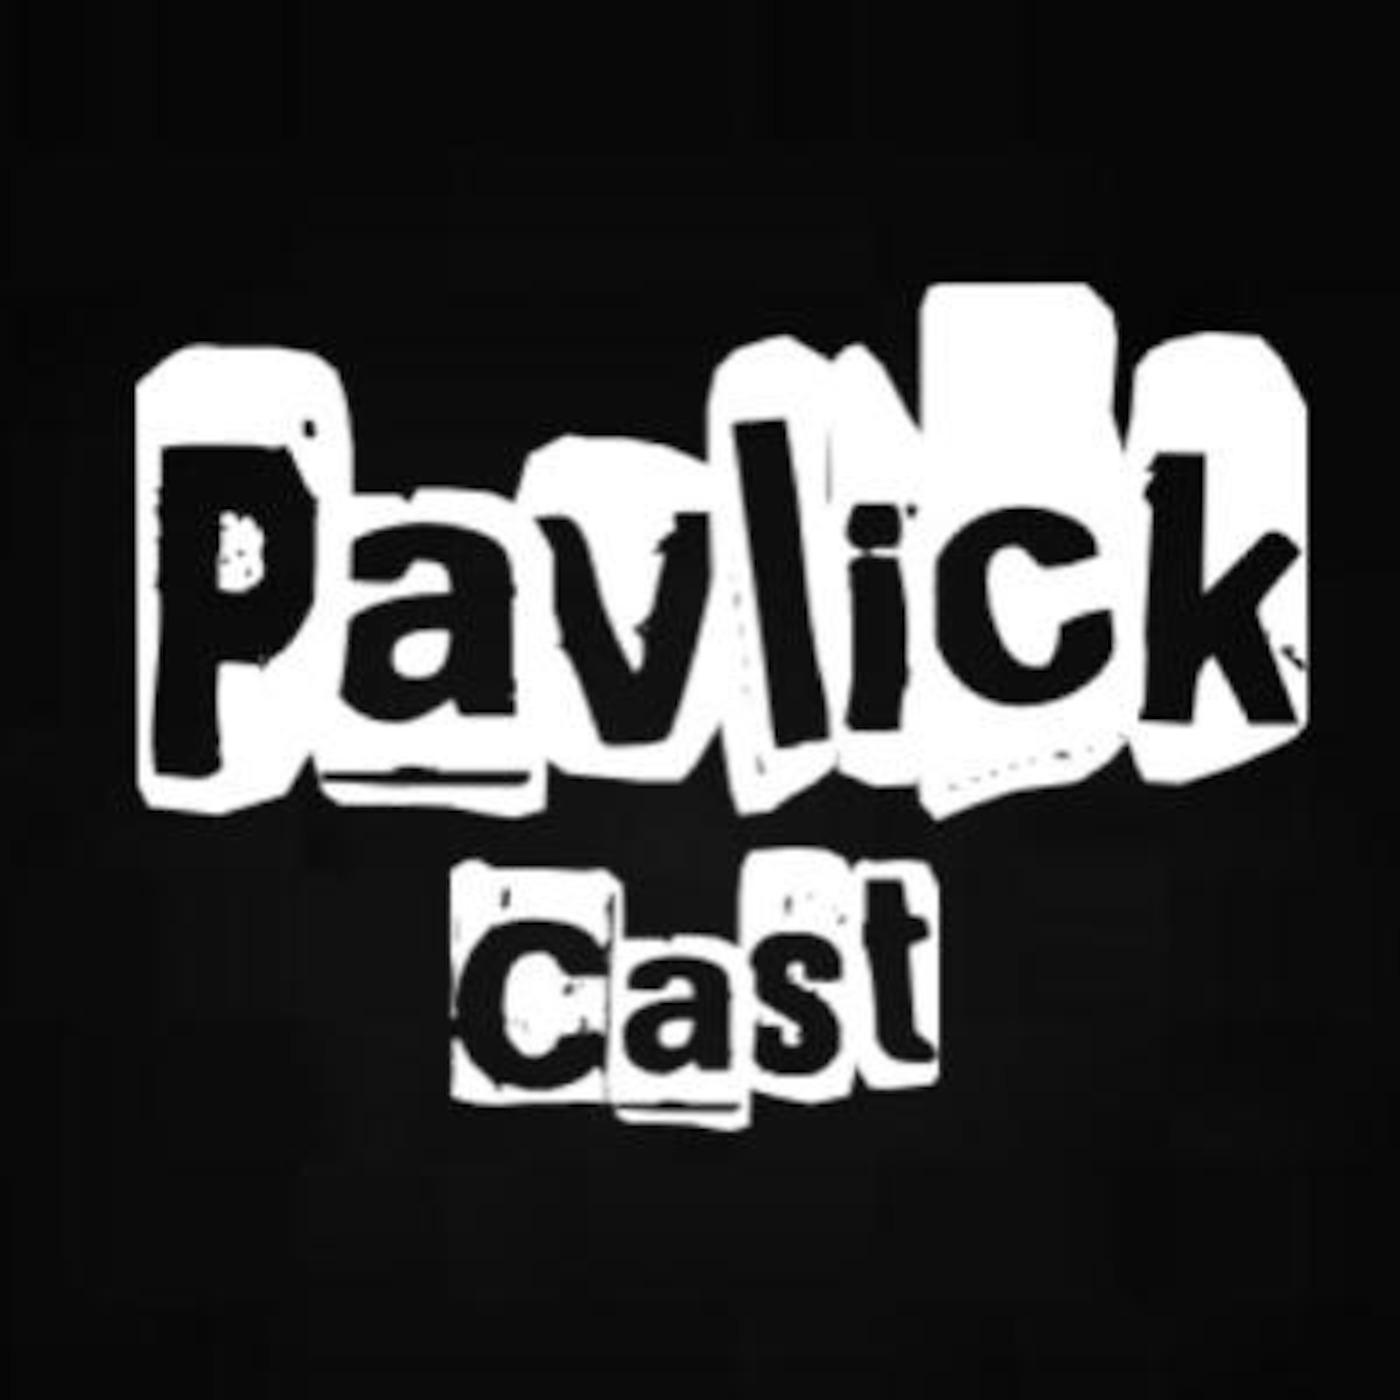 Pavlick Cast